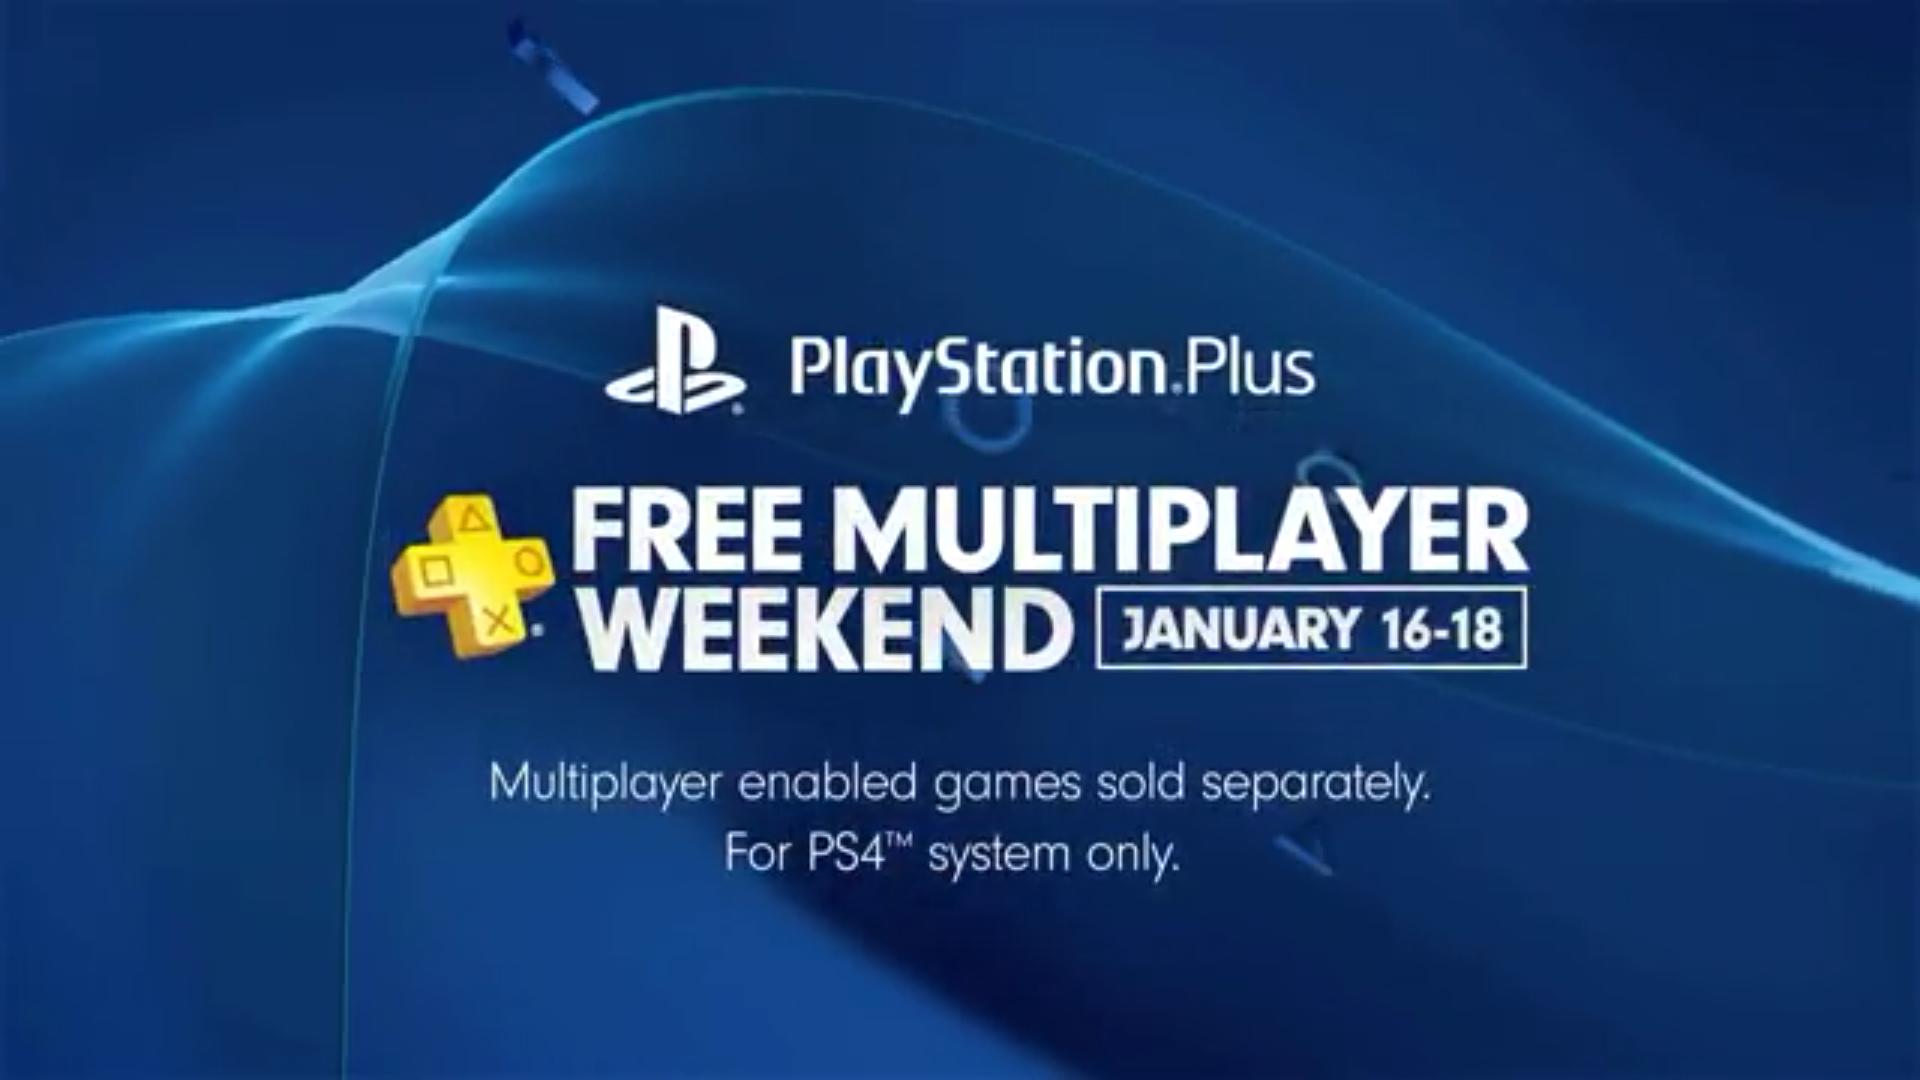 PSN+ Free Weekend